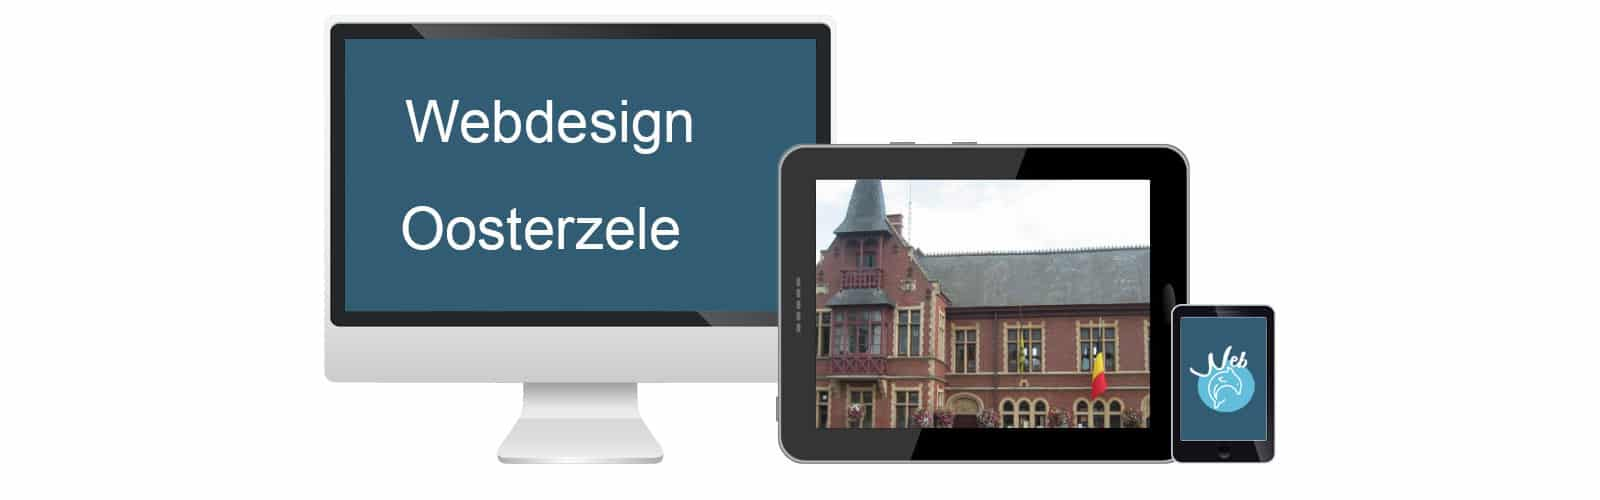 Webdesign Oosterzele - webdolfijn